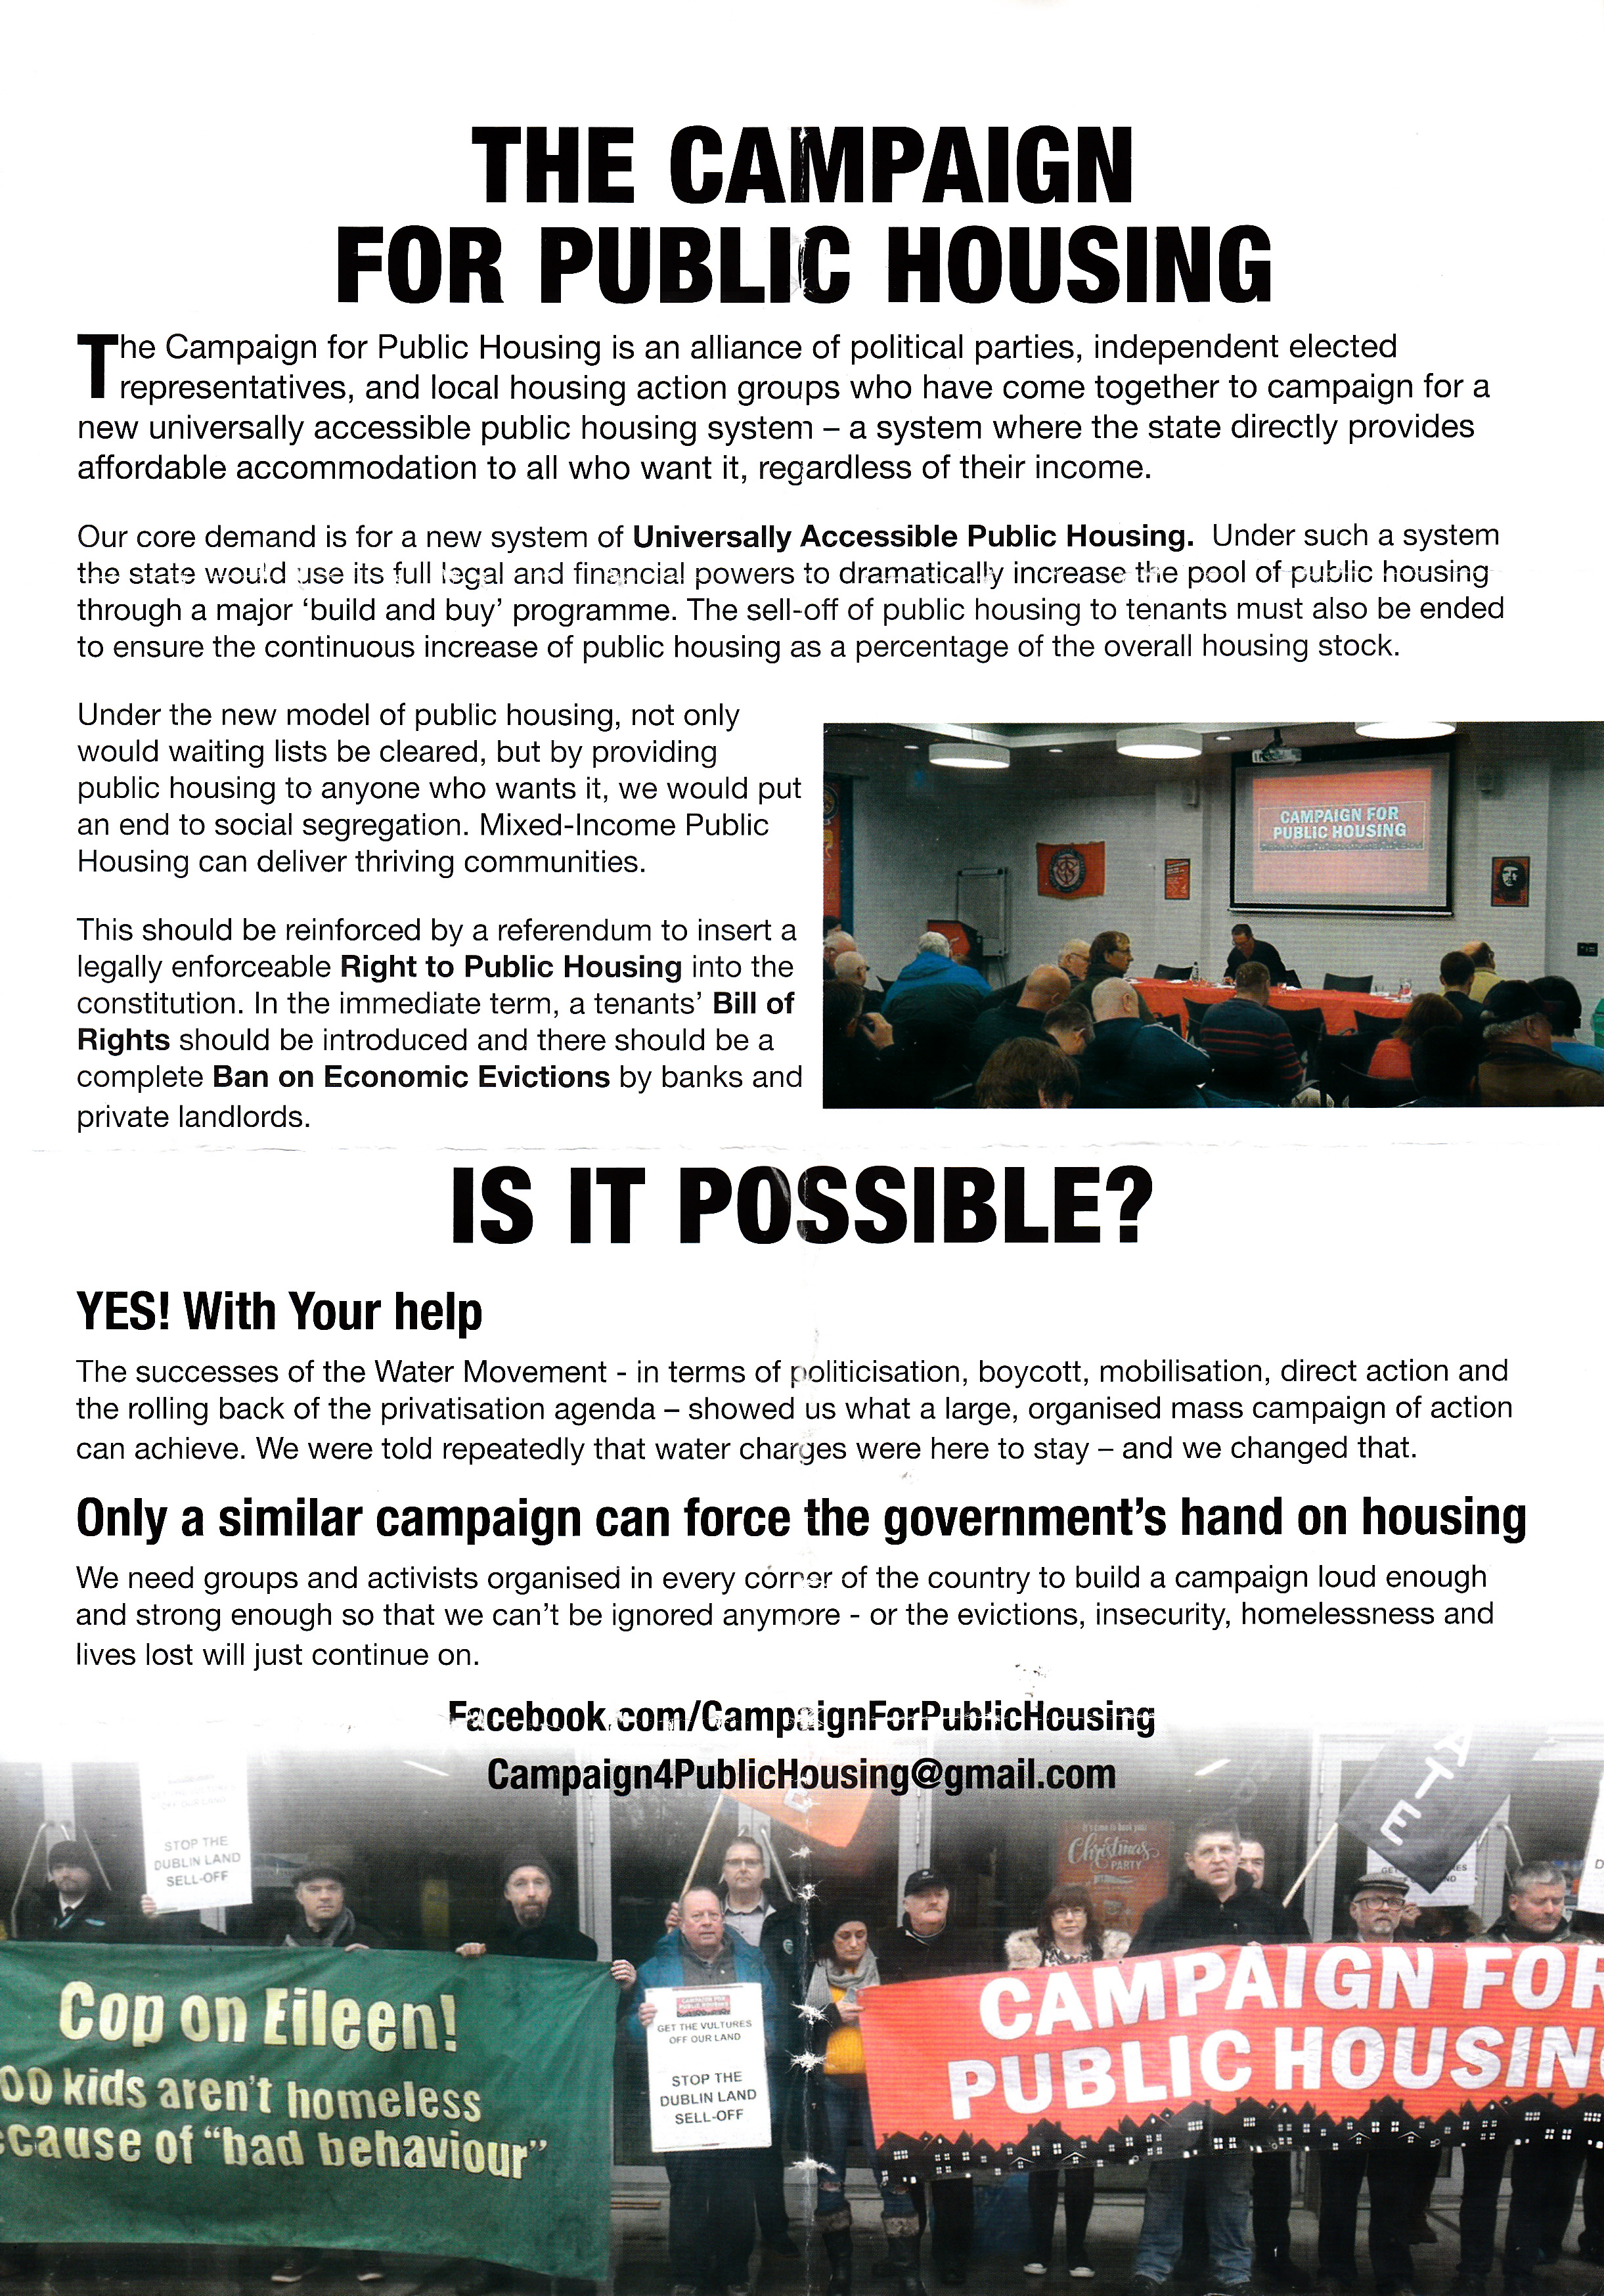 Campaign for public housing_0002